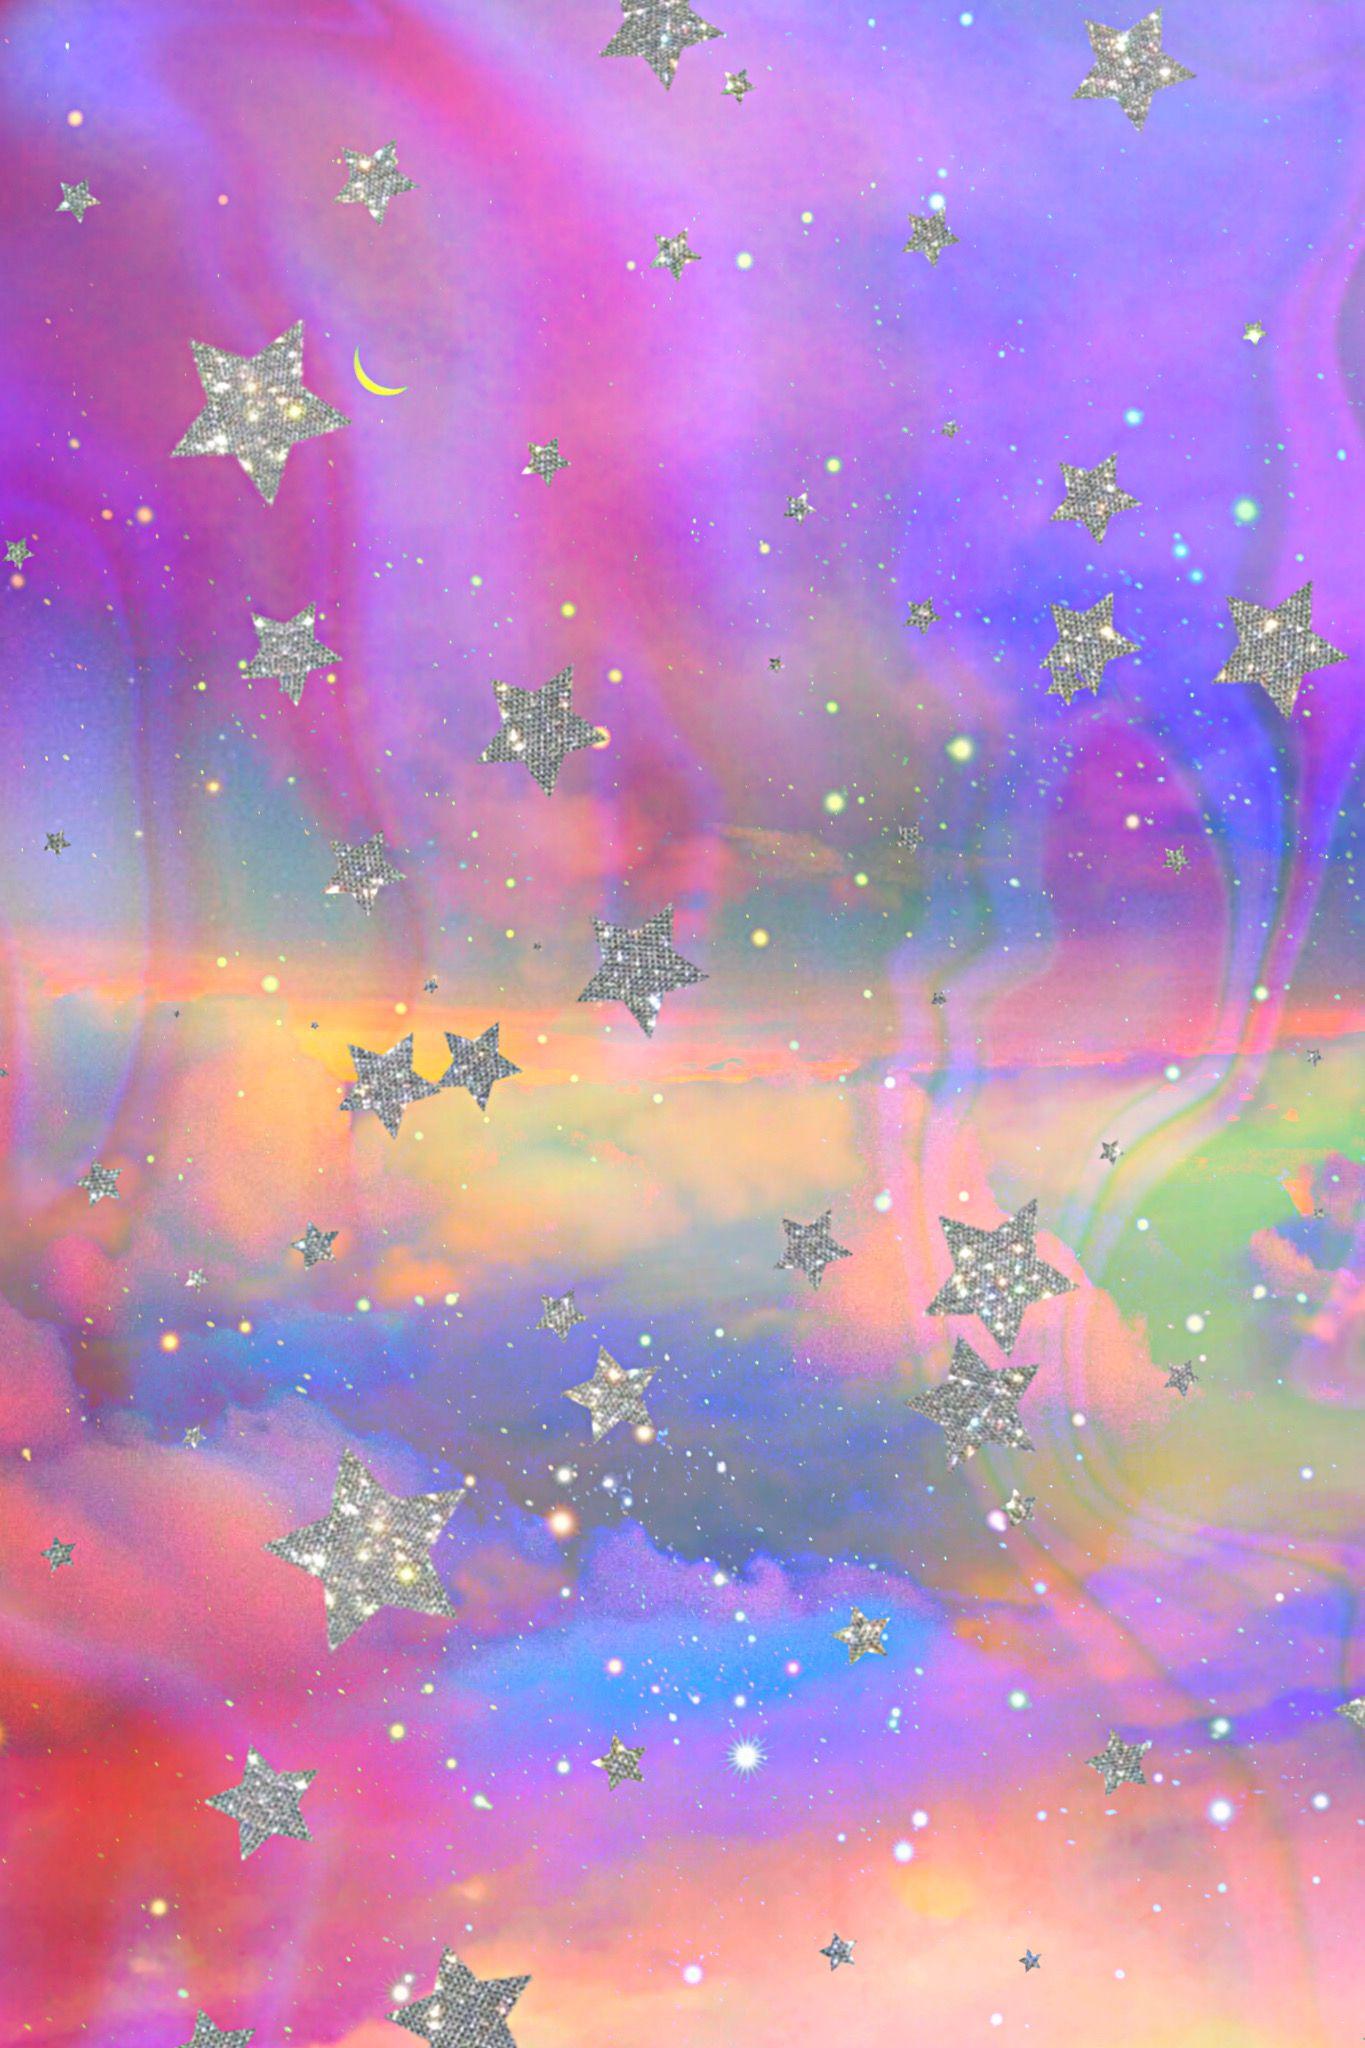 Marble Night Wallpaper Glitter Sparkle Galaxy Sky Stars Holographic Cosmos Rainbow Pastel Holographic Wallpapers Glitter Phone Wallpaper Star Wallpaper